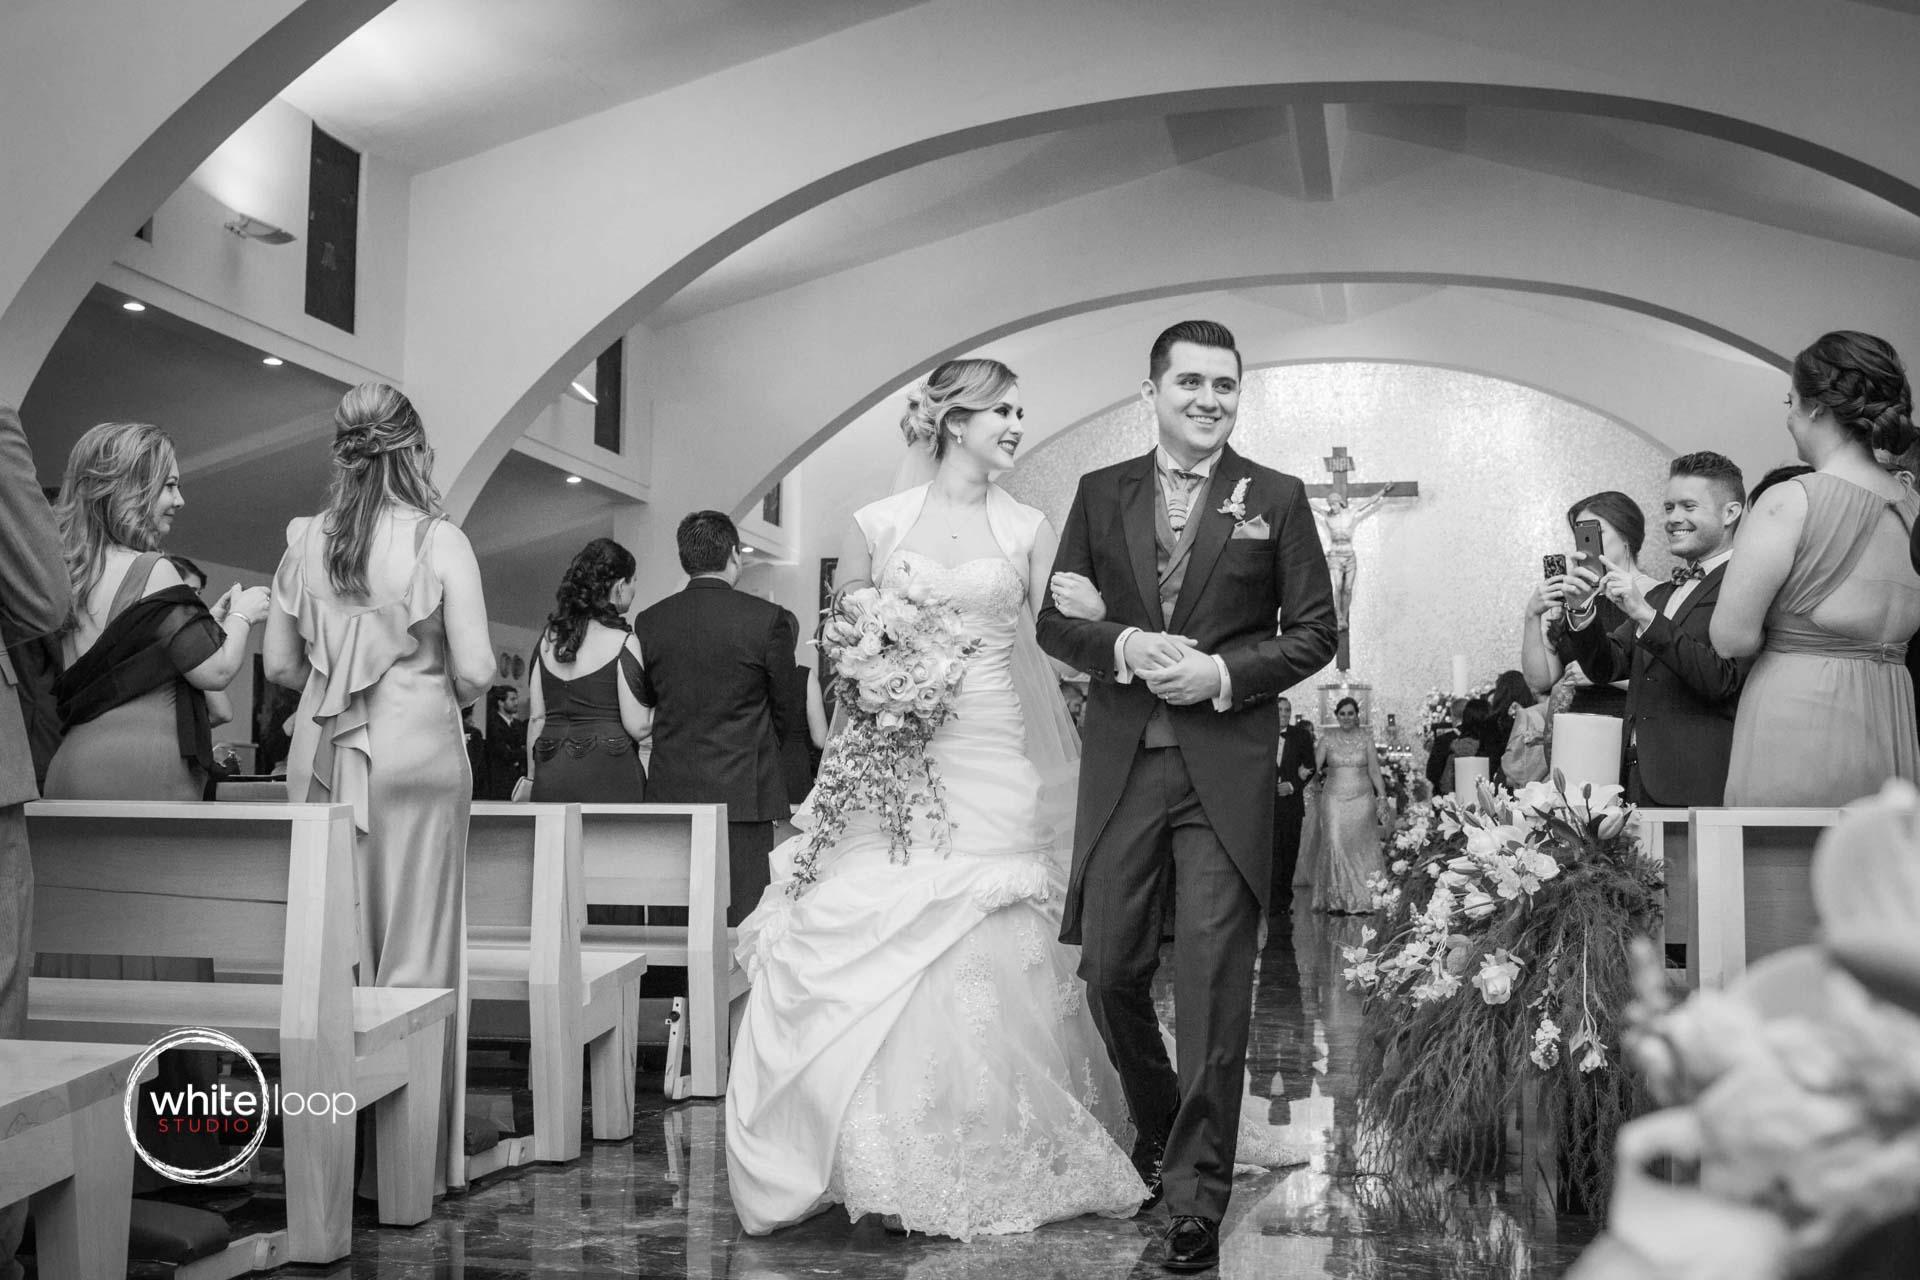 Vanessa and Chuy, Ceremony, San Juan Macias, Guadalajara, Mexico